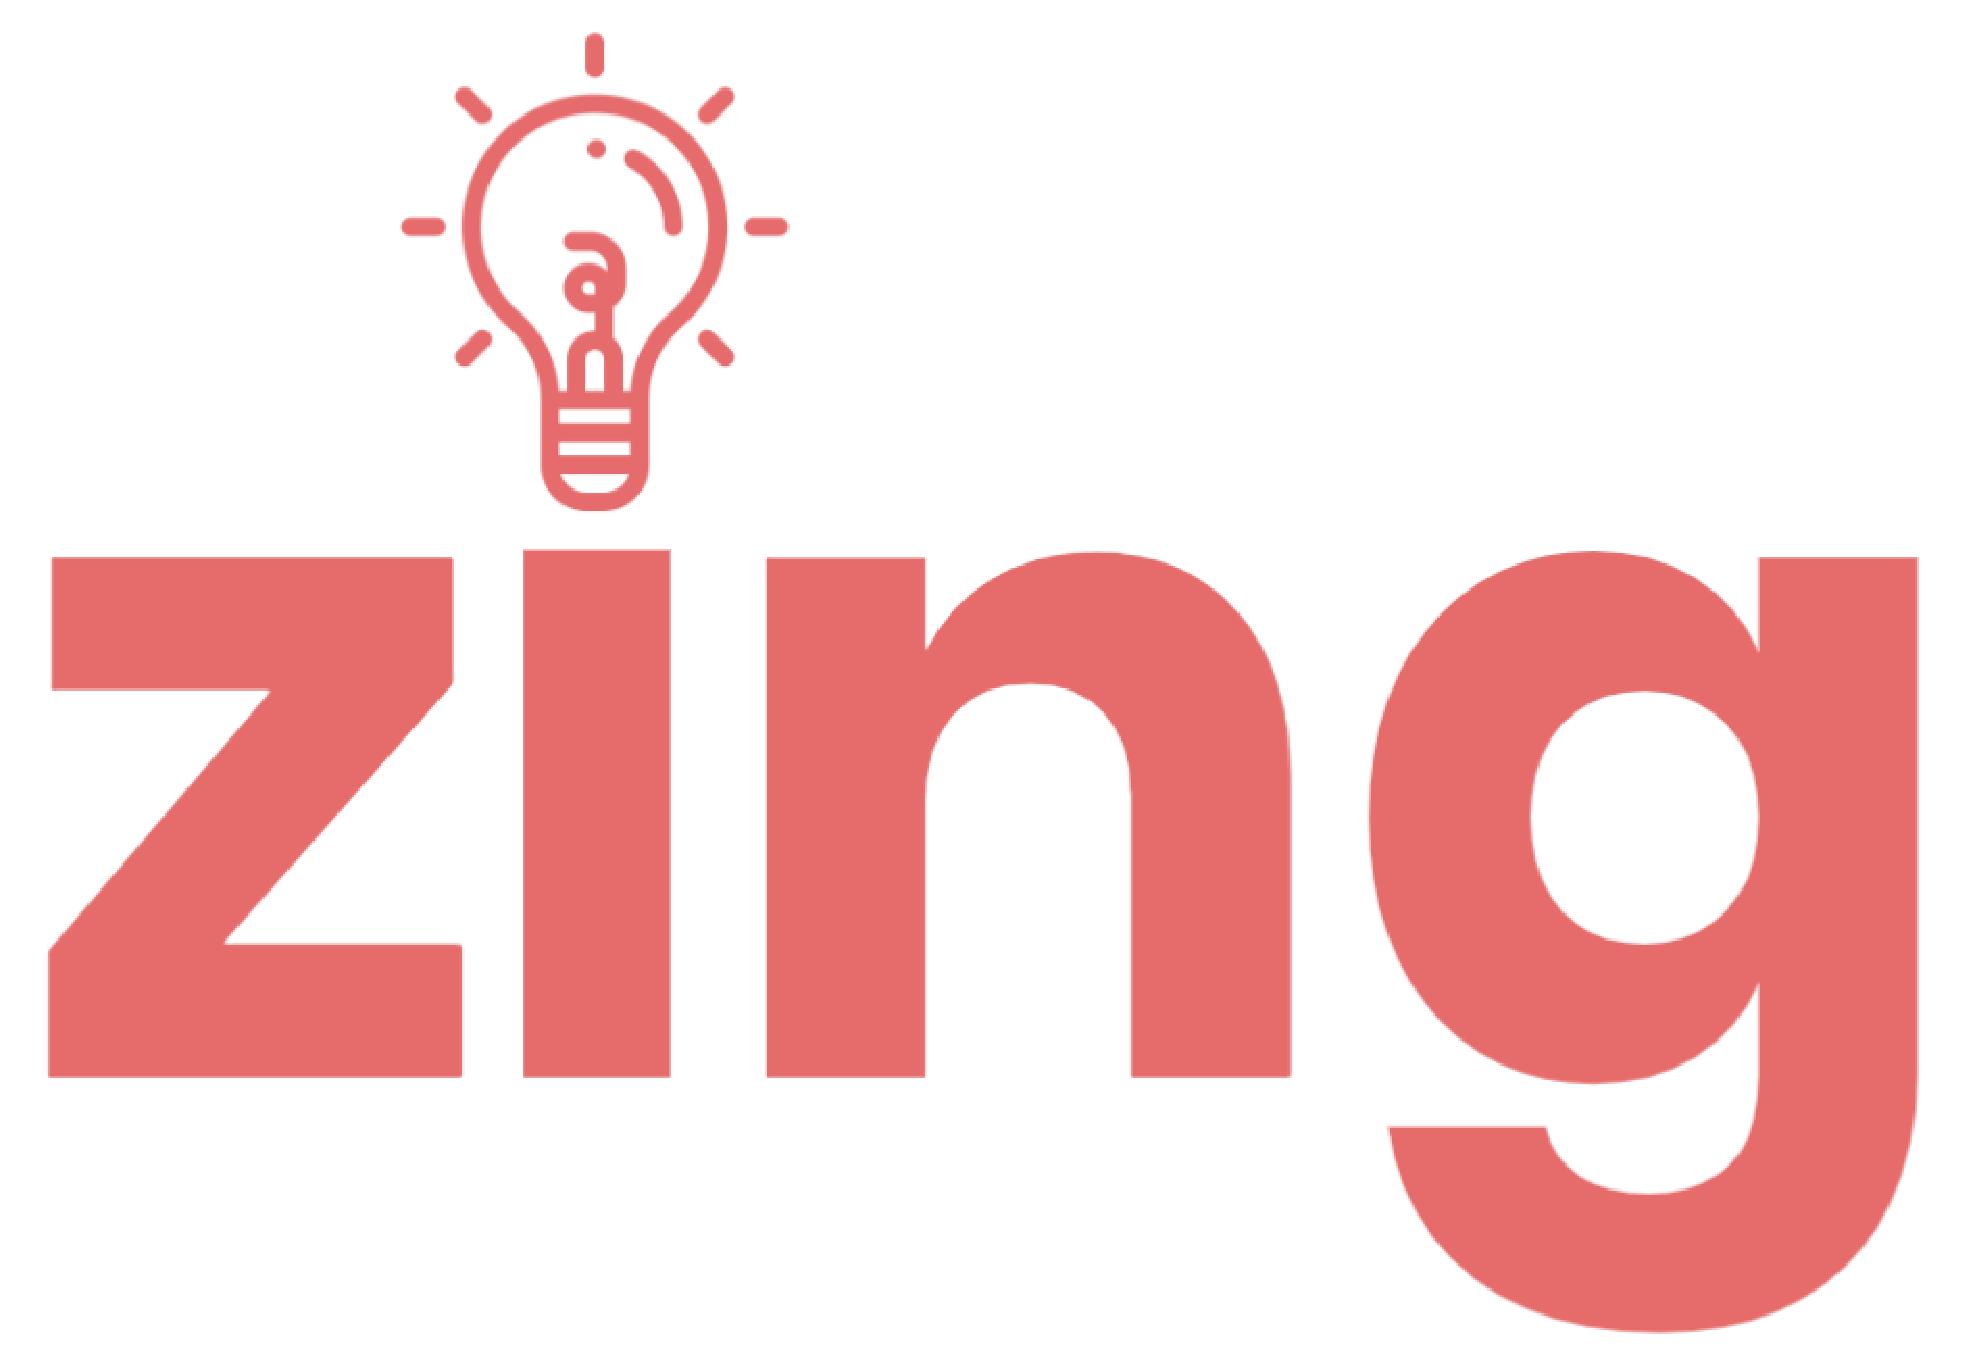 Zing.png